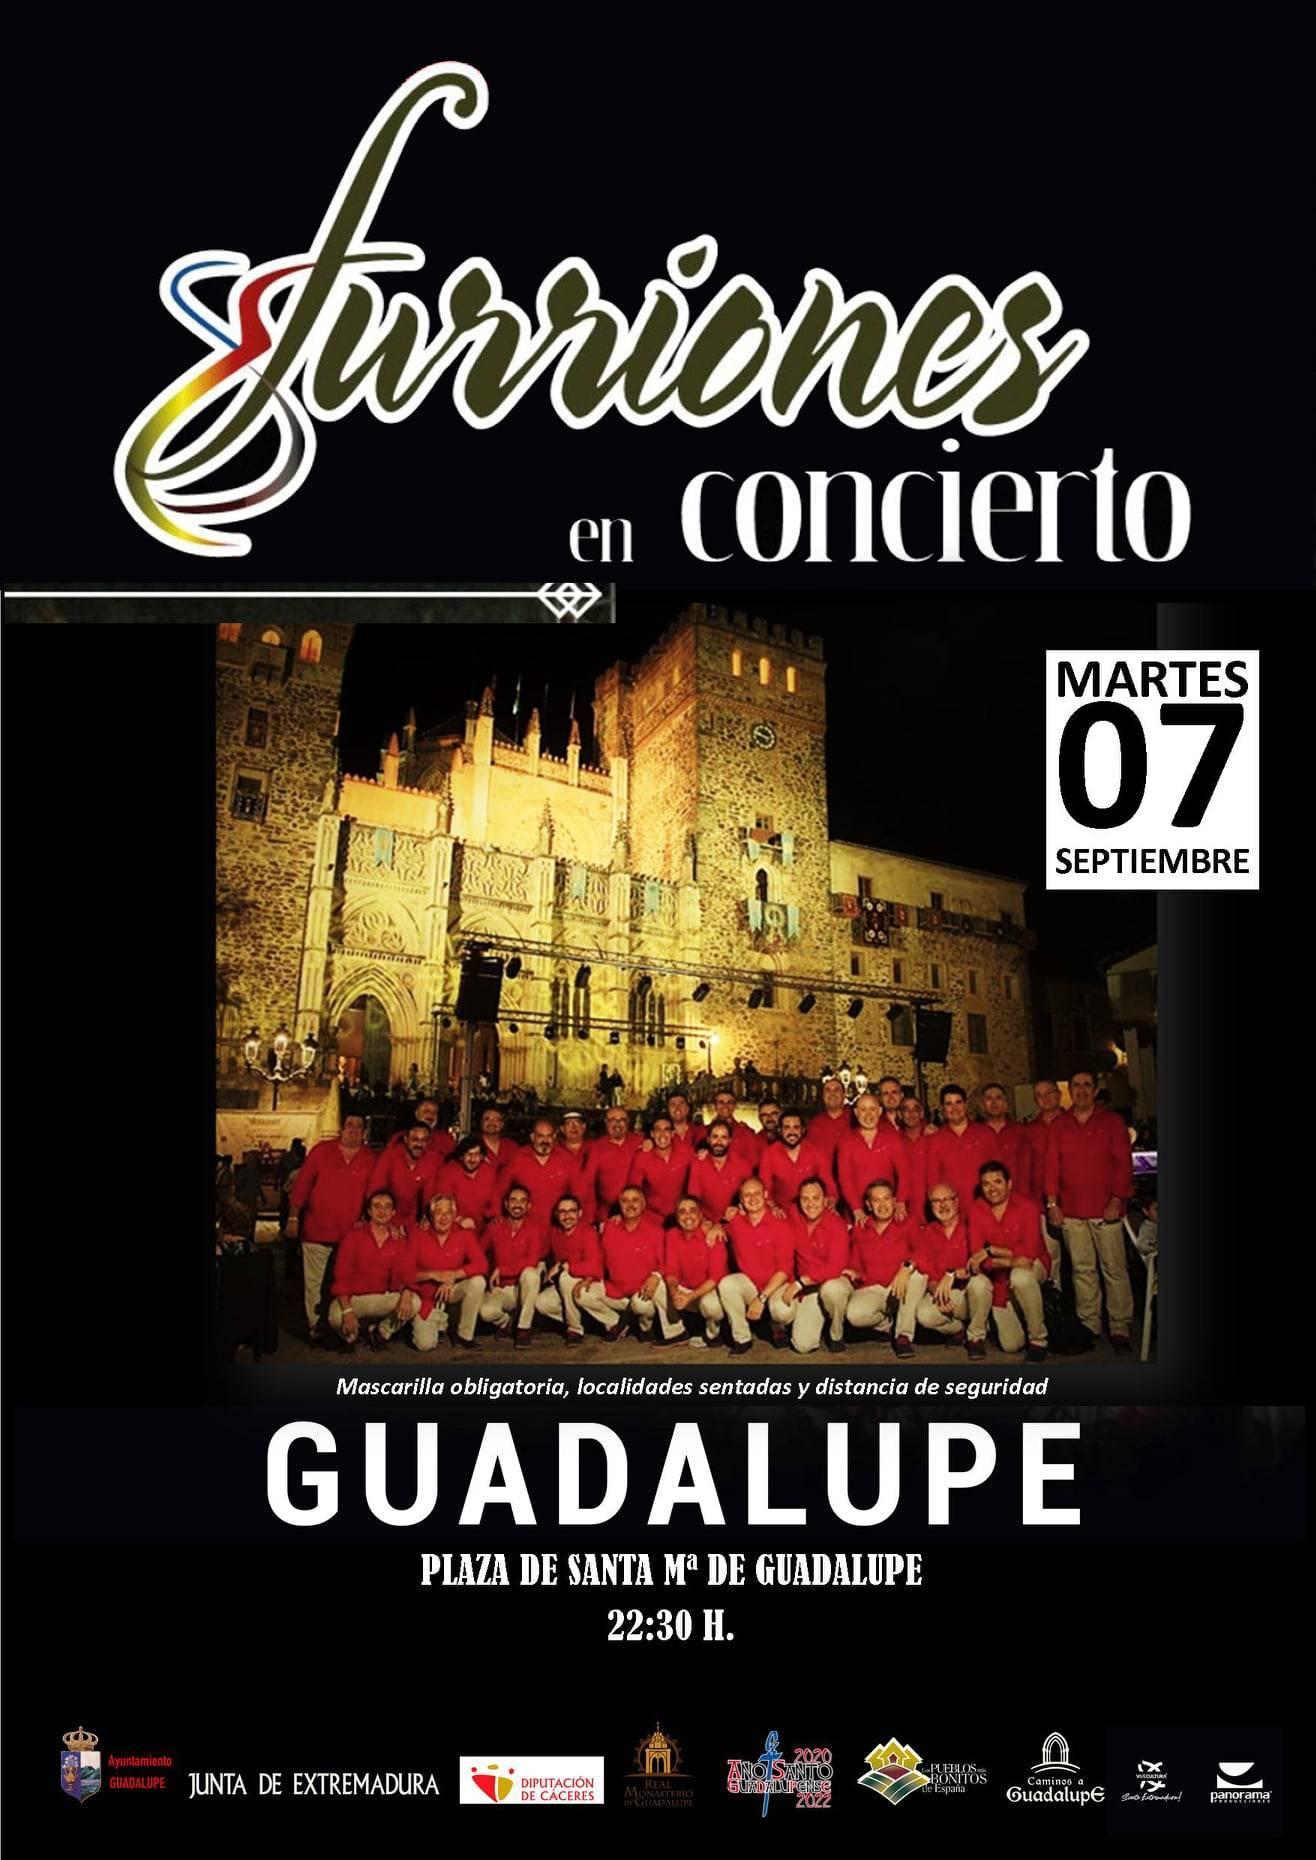 Furriones (2021) - Guadalupe (Cáceres)